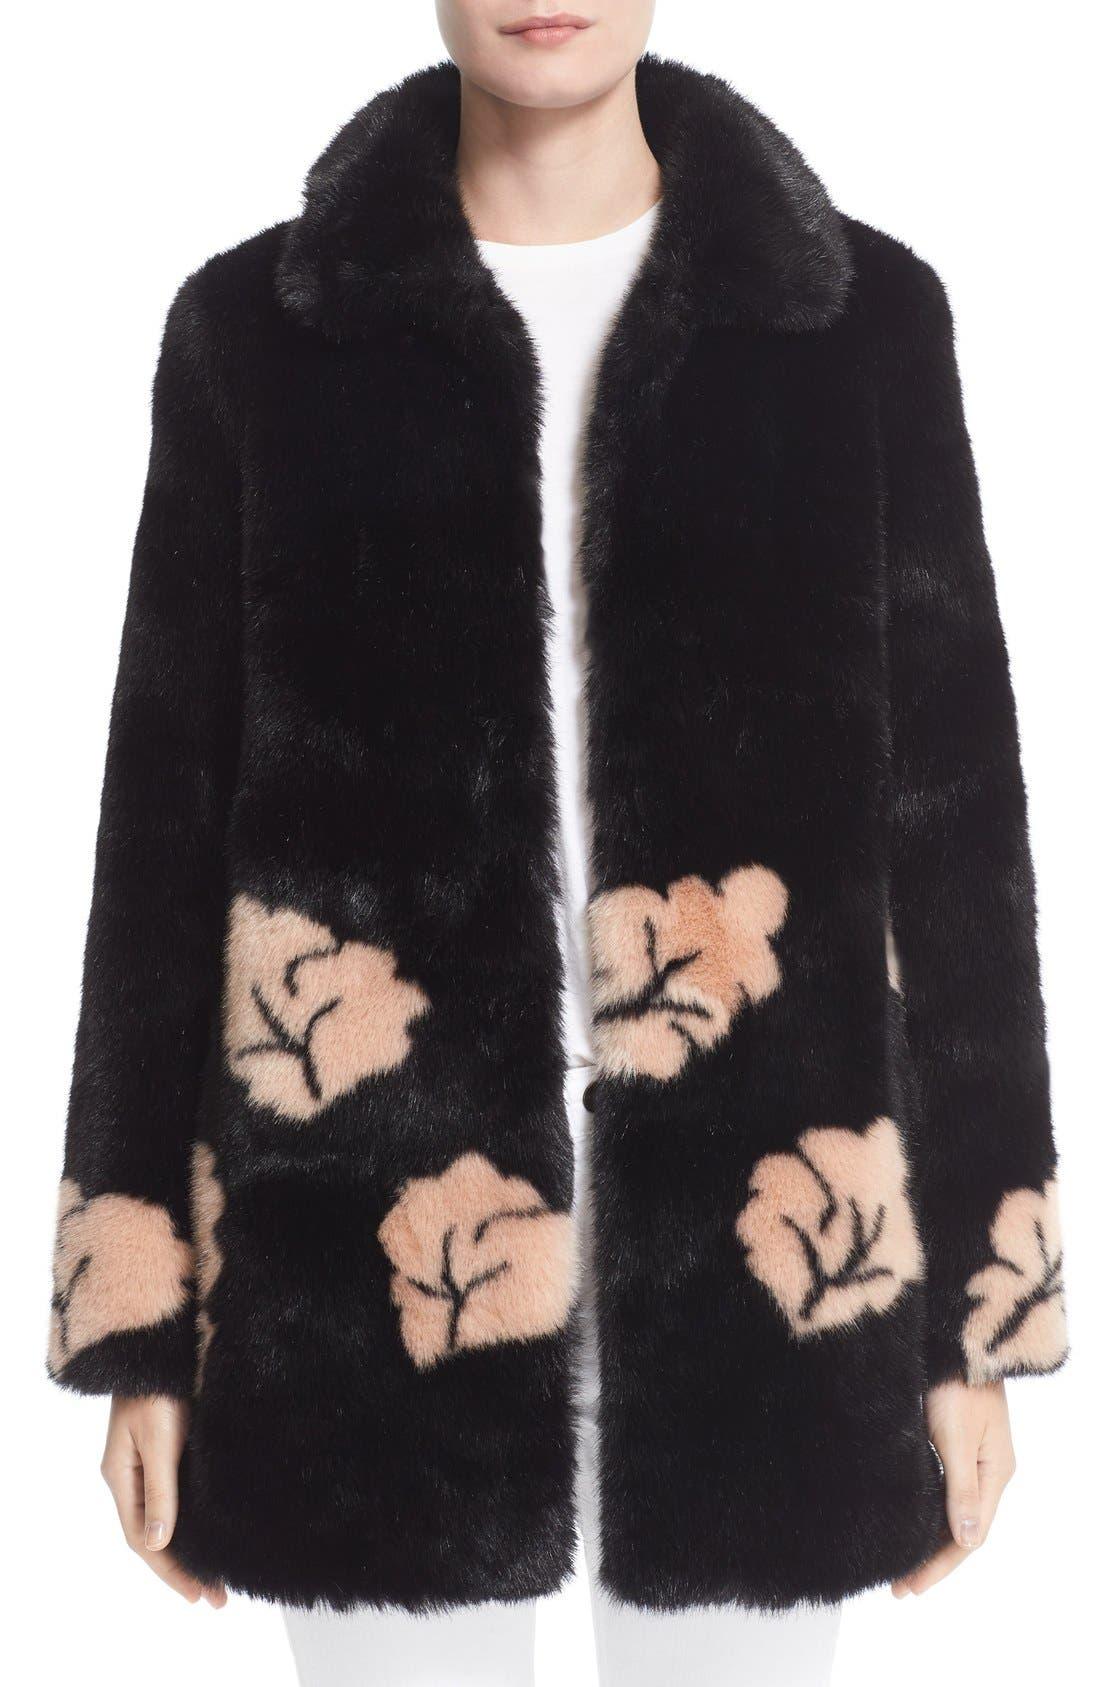 Alternate Image 1 Selected - Shrimps Margery Faux Fur Coat